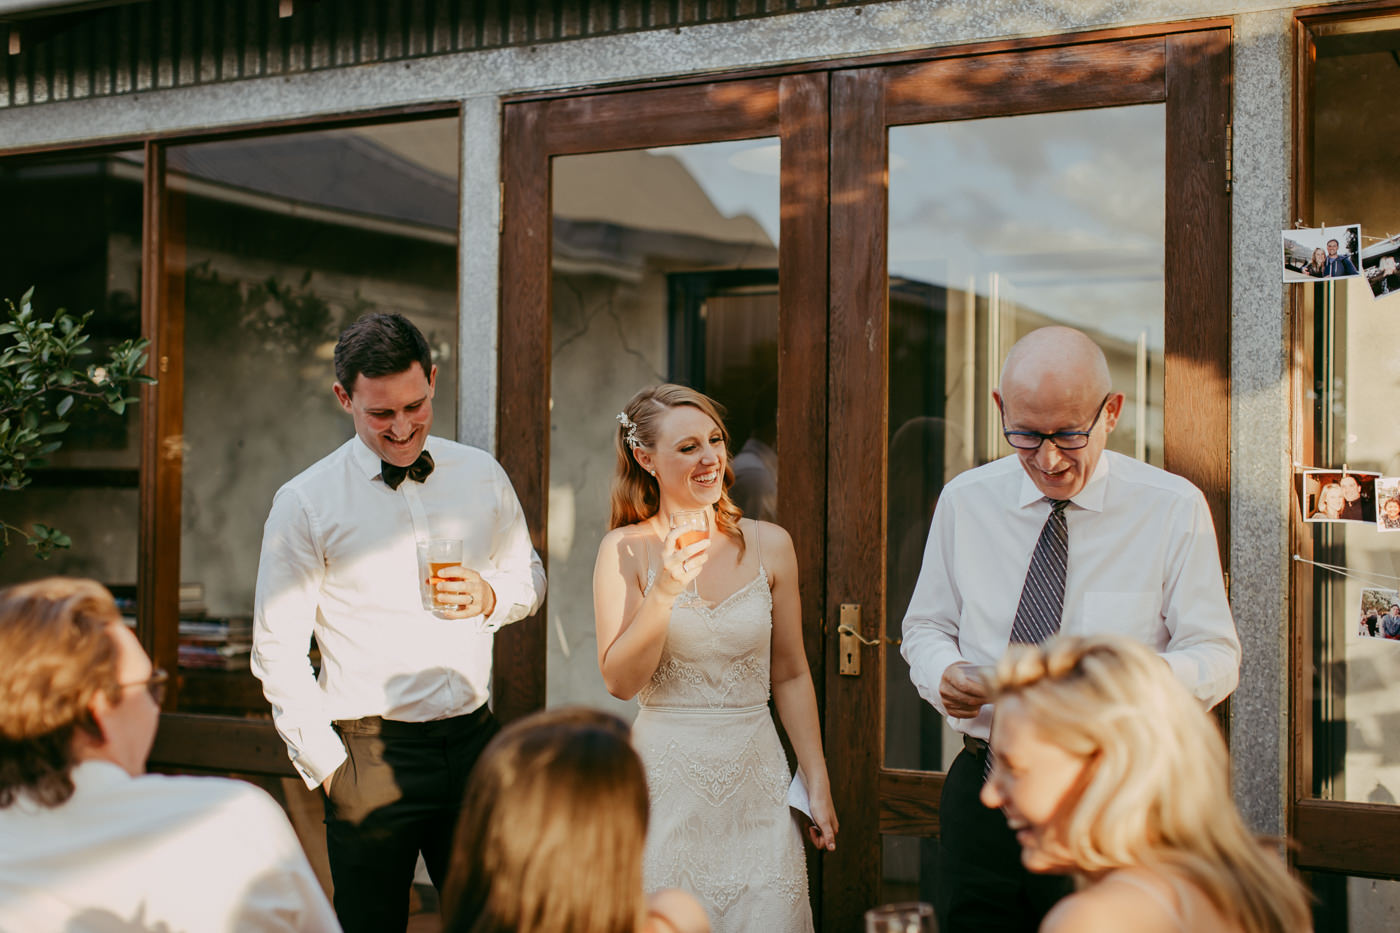 Anthony & Eliet - Wagga Wagga Wedding - Country NSW - Samantha Heather Photography-138.jpg